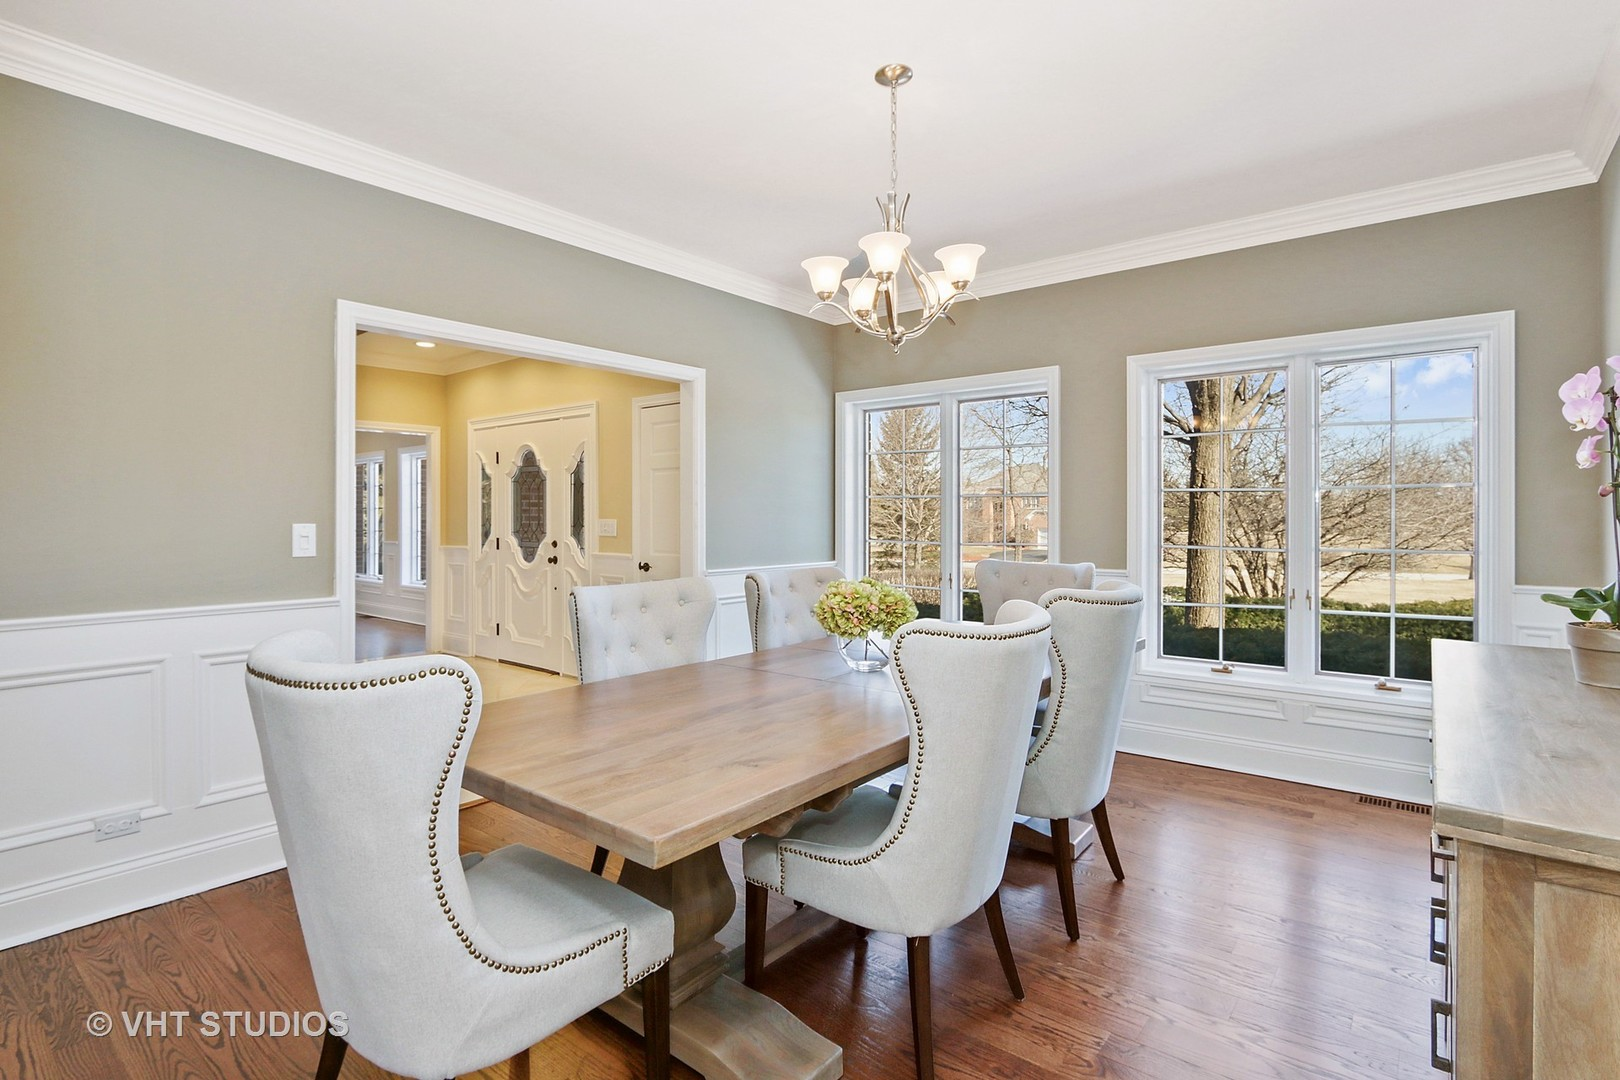 PropertyUP[09886762]|sale| 203 Peregrine Hawthorn woods, Illinois ...